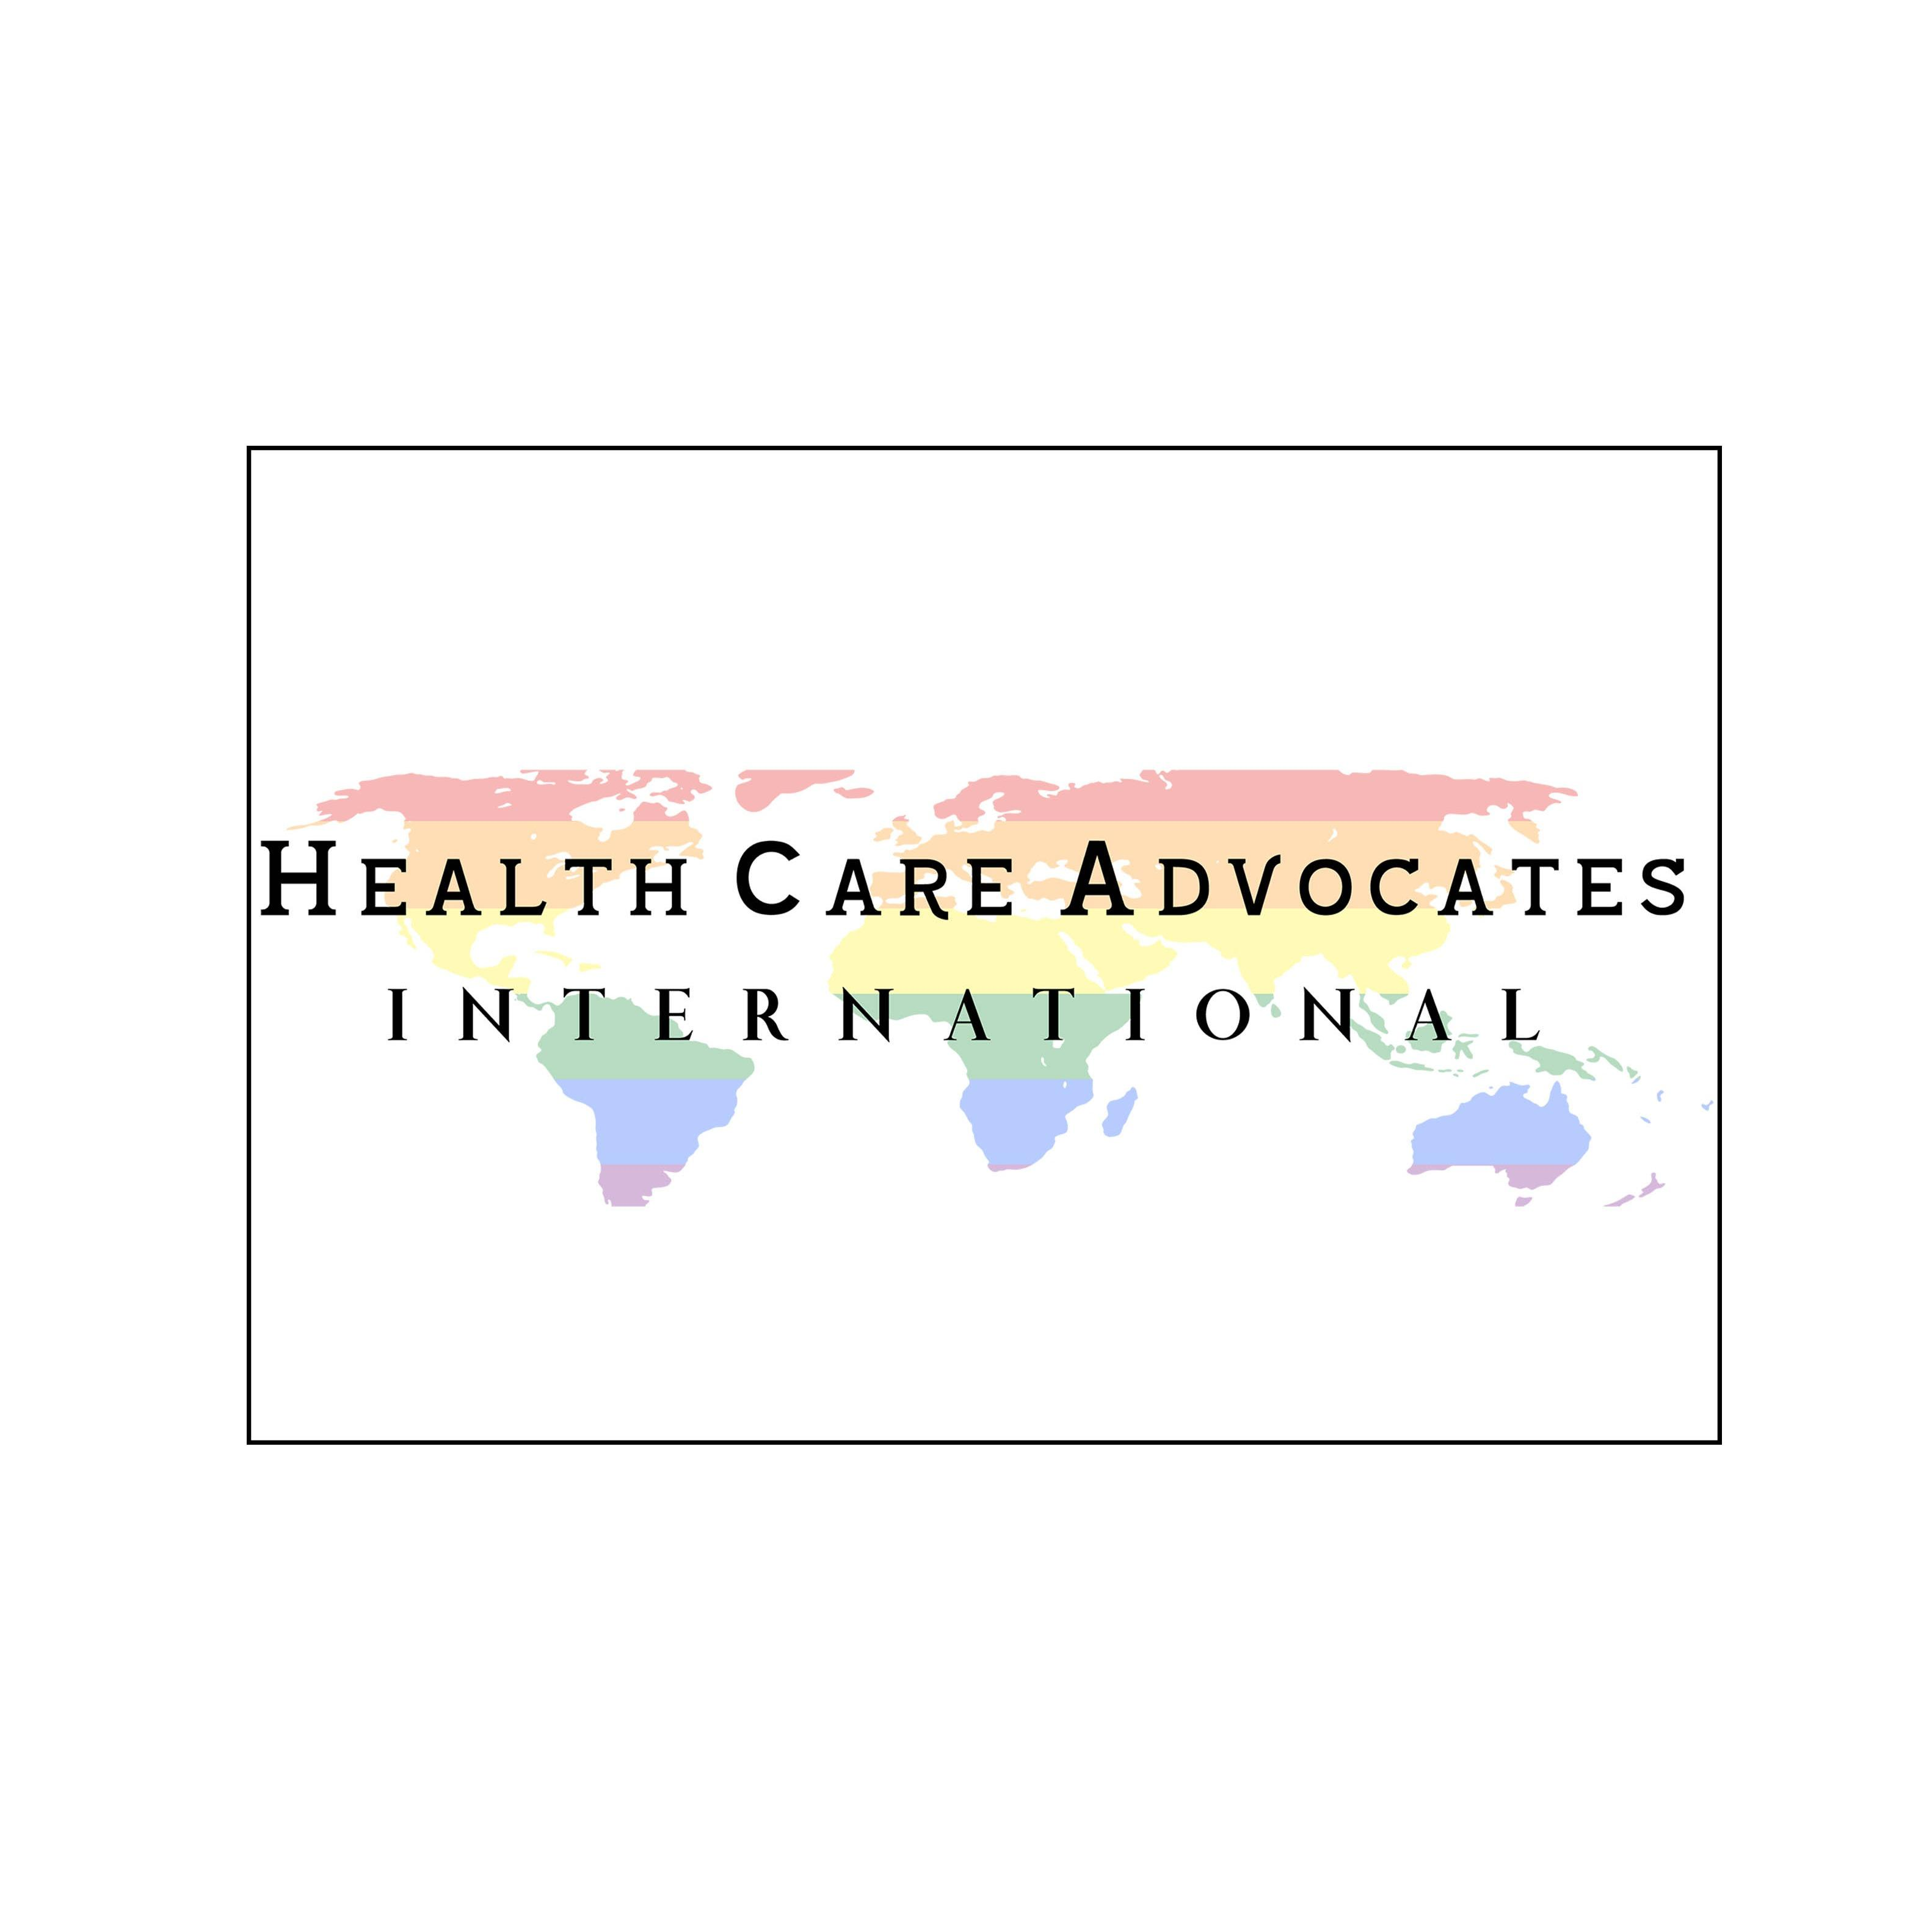 Health Care Advocates International